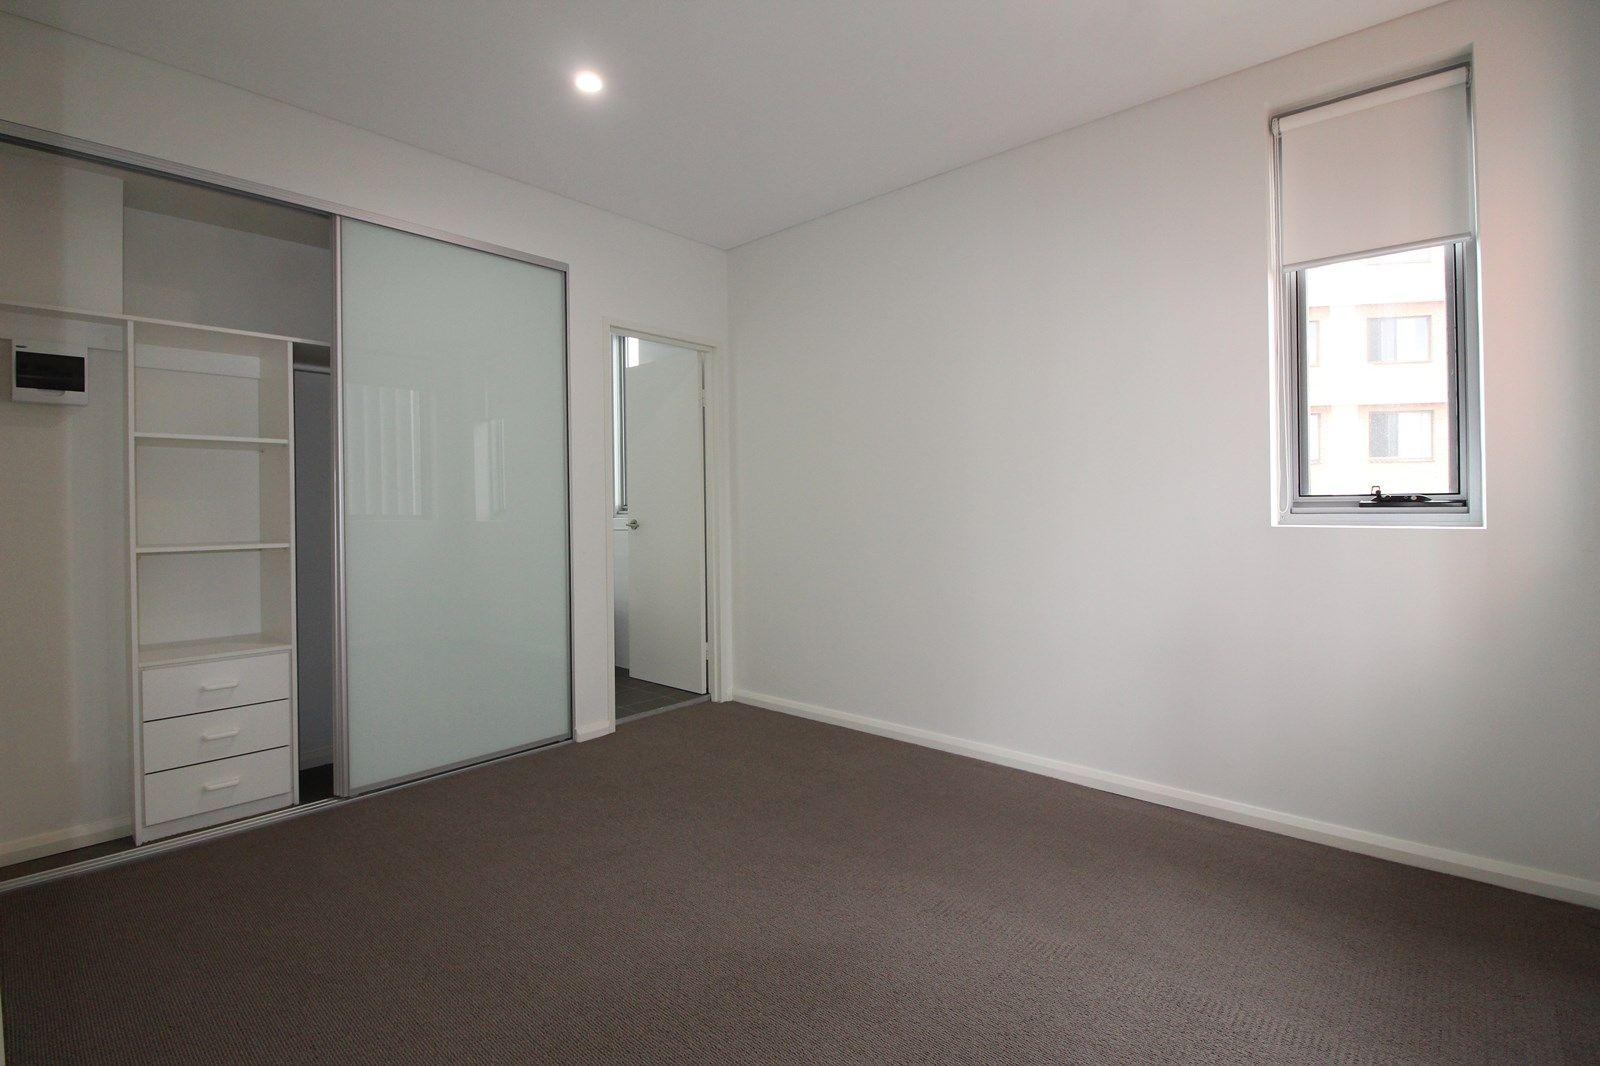 26/37 Campbell Street, Parramatta NSW 2150, Image 1